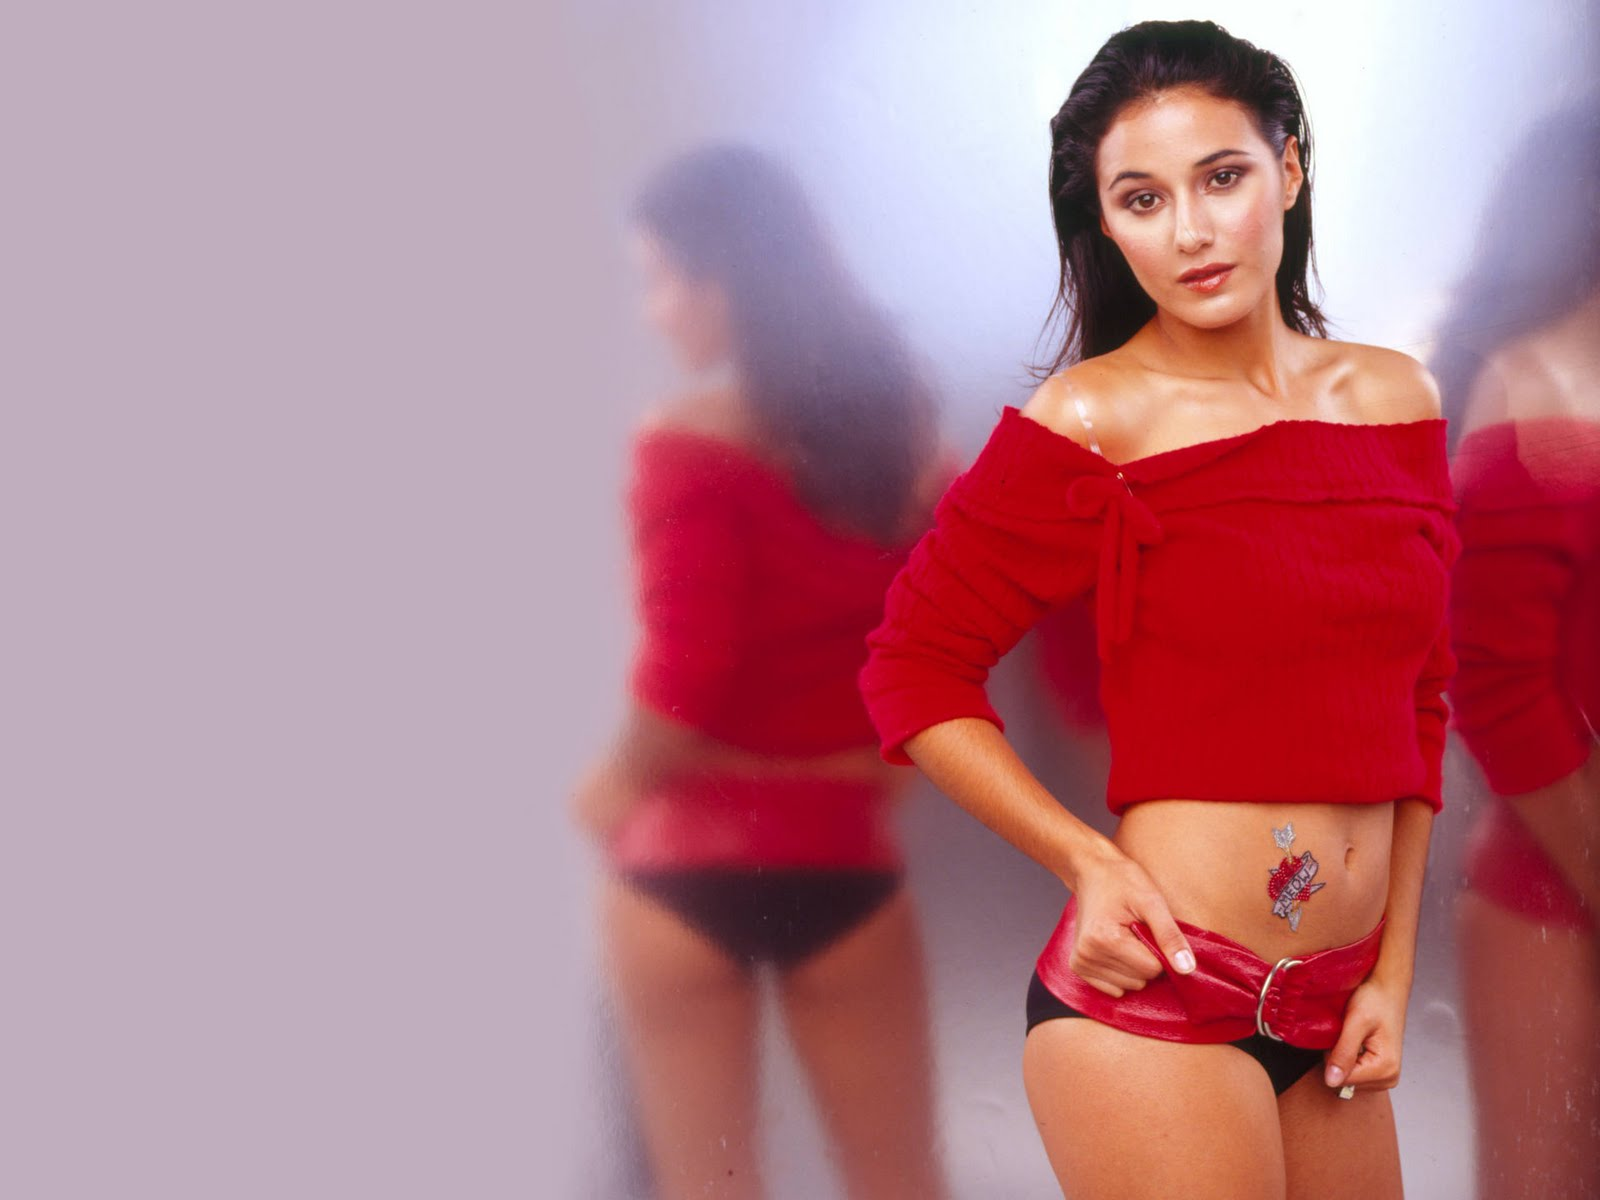 http://1.bp.blogspot.com/-OVIcPkZQ94A/TuDloZwtO6I/AAAAAAAAKbs/pglP553xETw/s1600/Emmanuelle_Chriqui_HD_Wallpaper_red_bikini.jpg